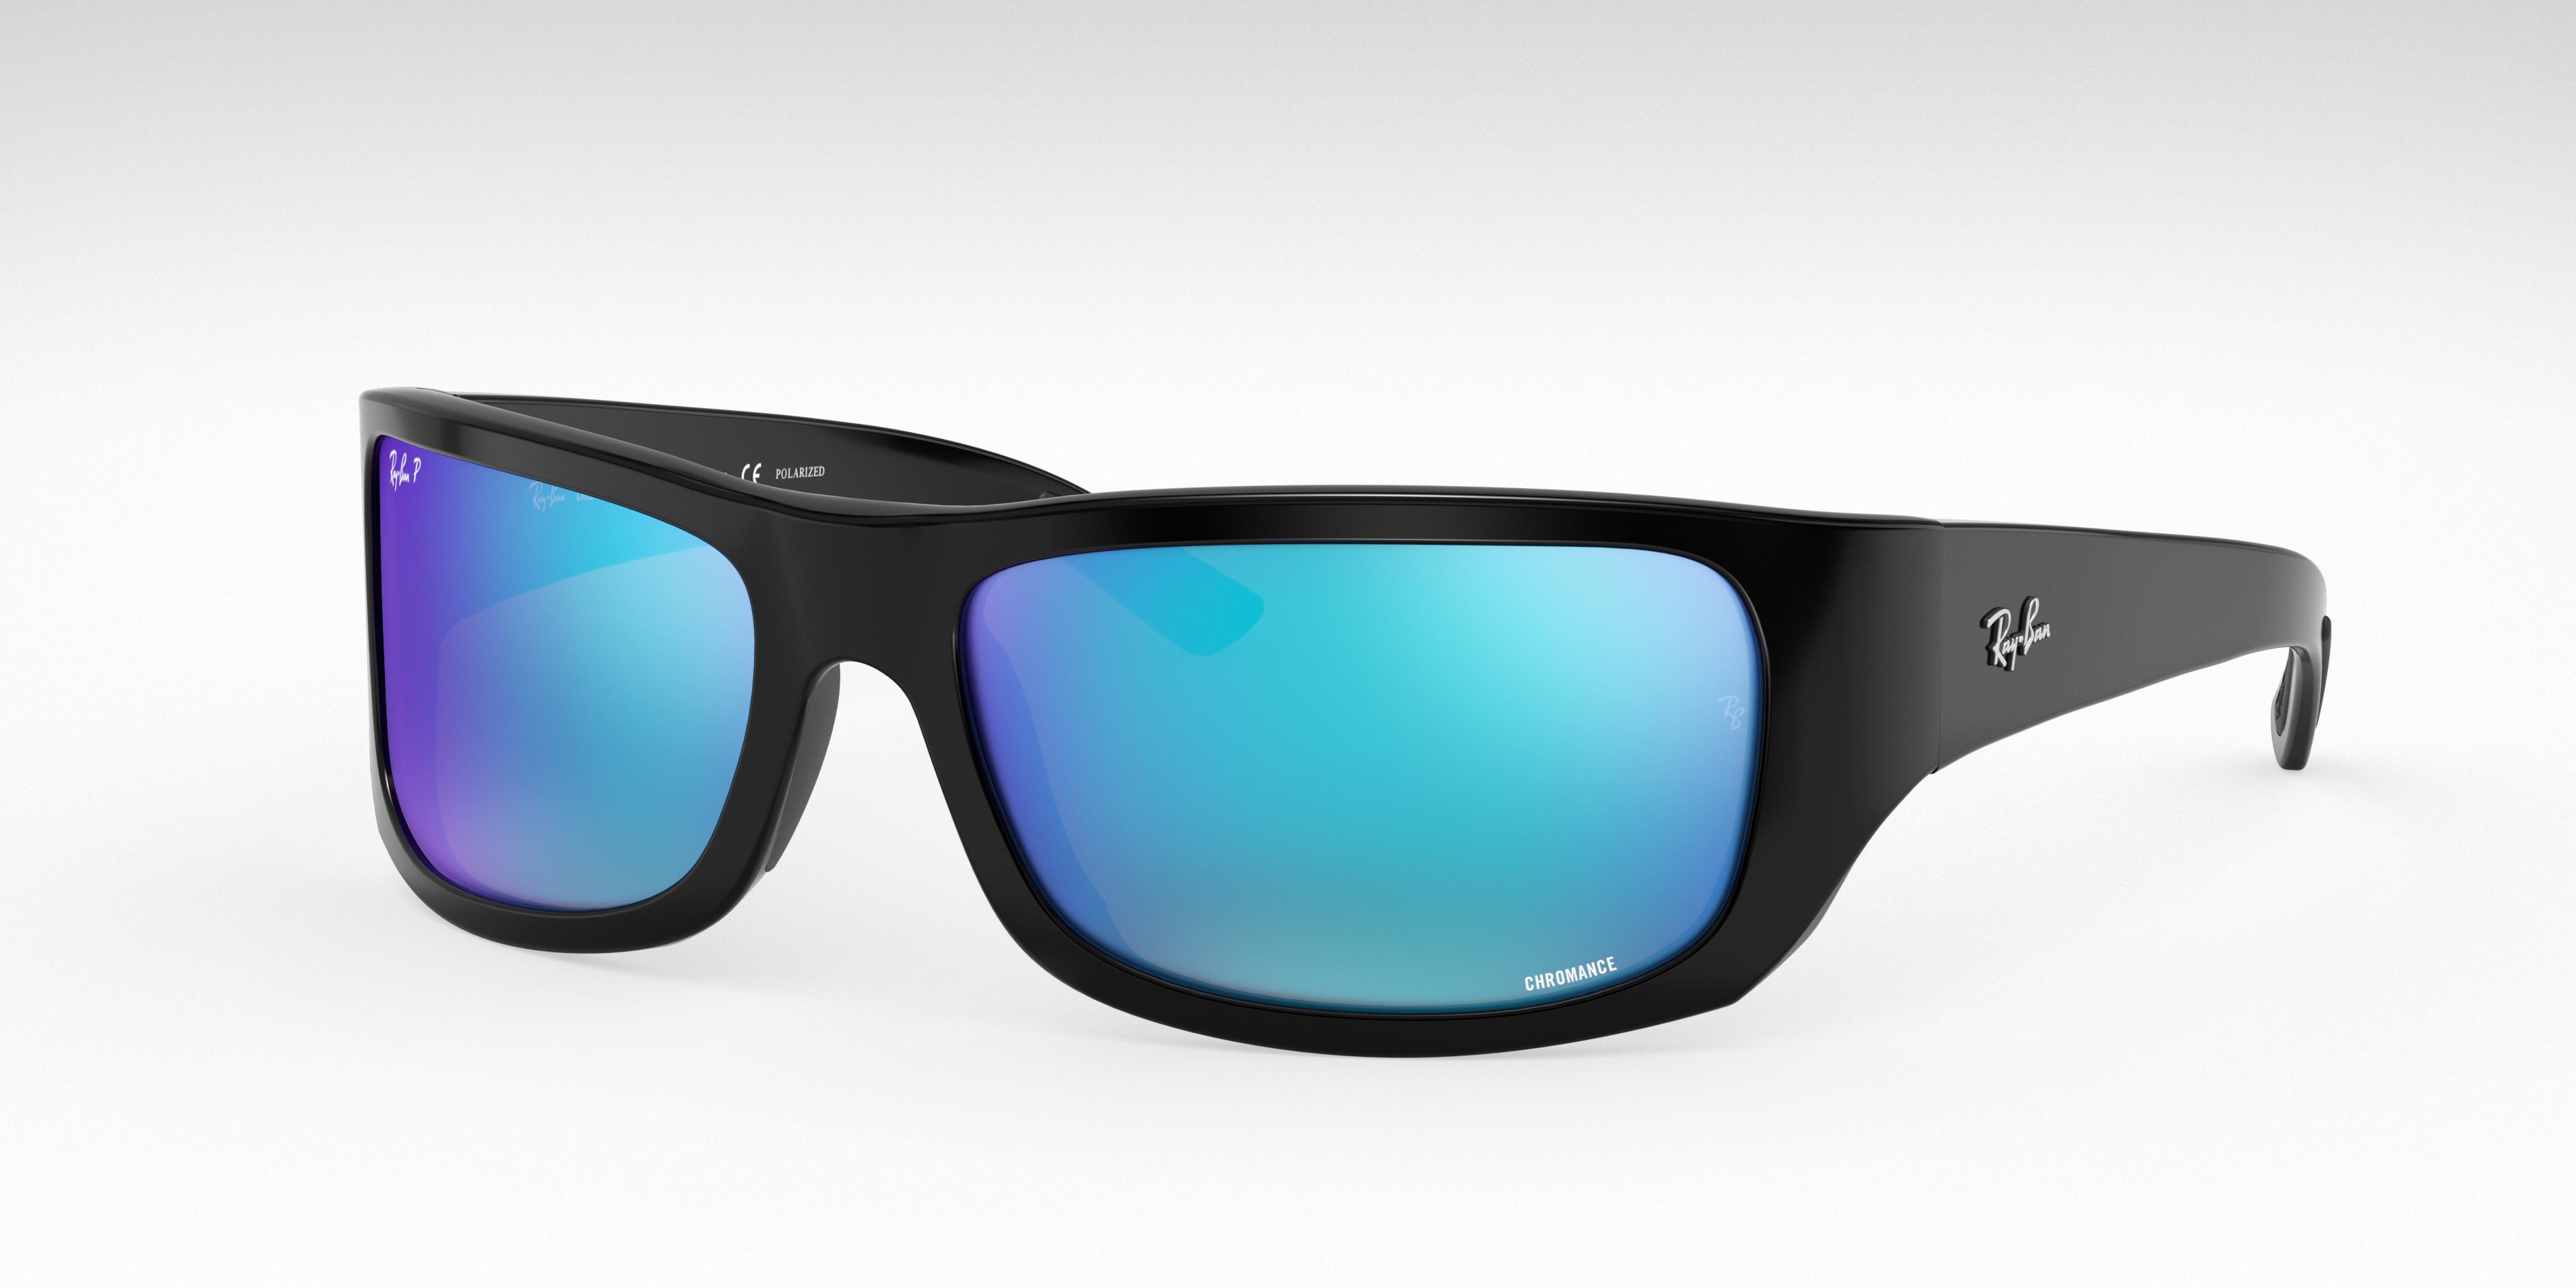 Ray-Ban Rb4283 Chromance Black, Polarized Blue Lenses - RB4283CH